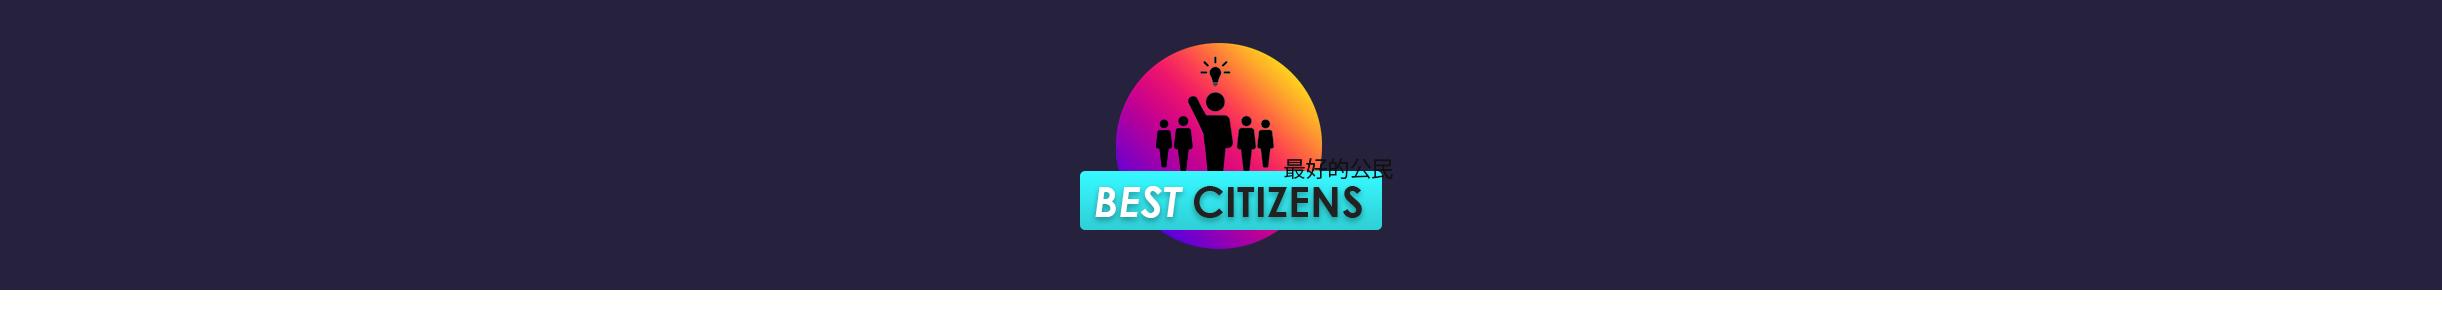 Best Citizens